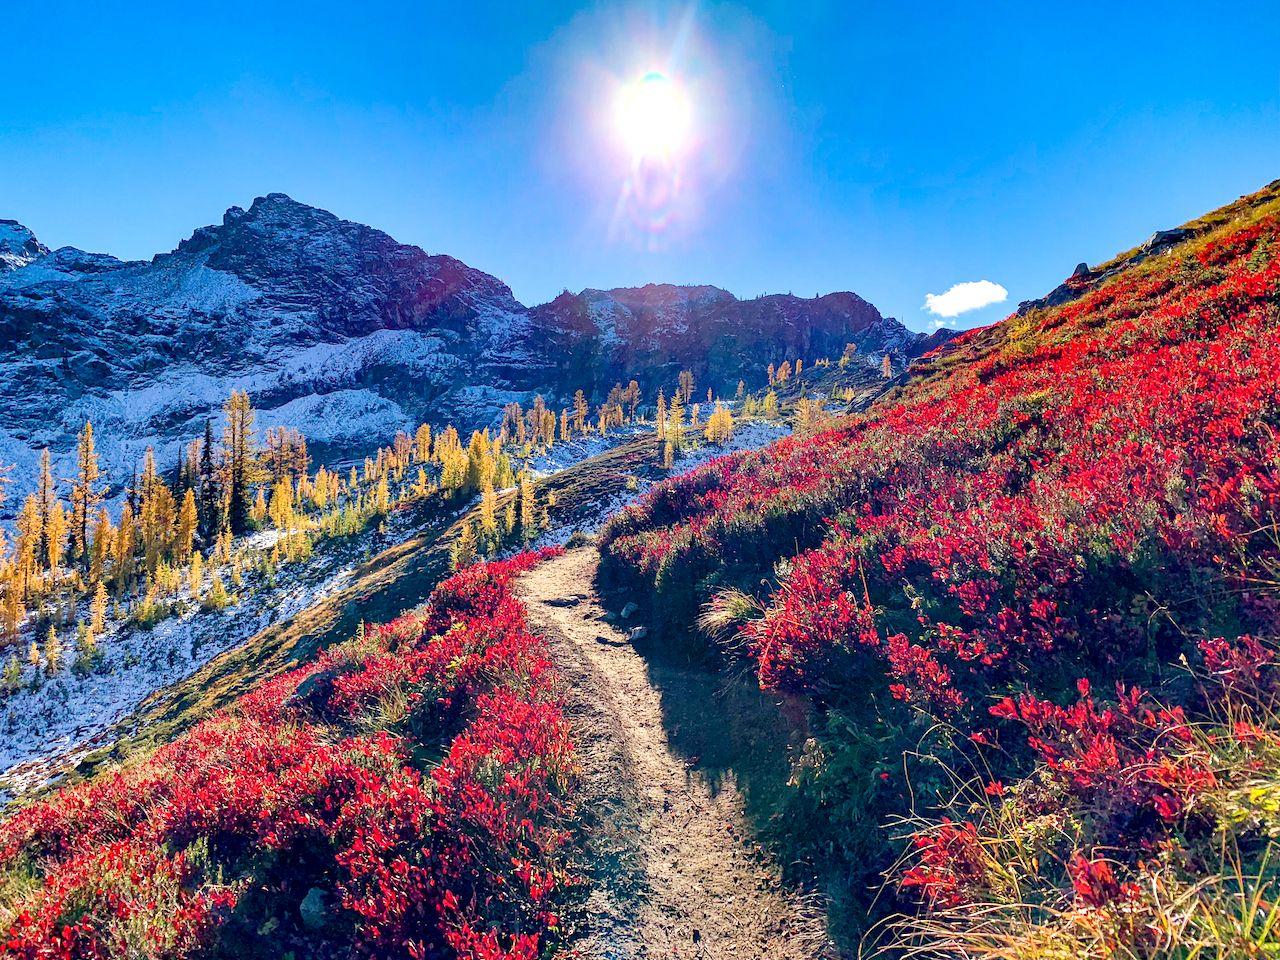 Washington, USA: Heather Maple Pass Loop trail near Mount Baker, North Cascades National Park